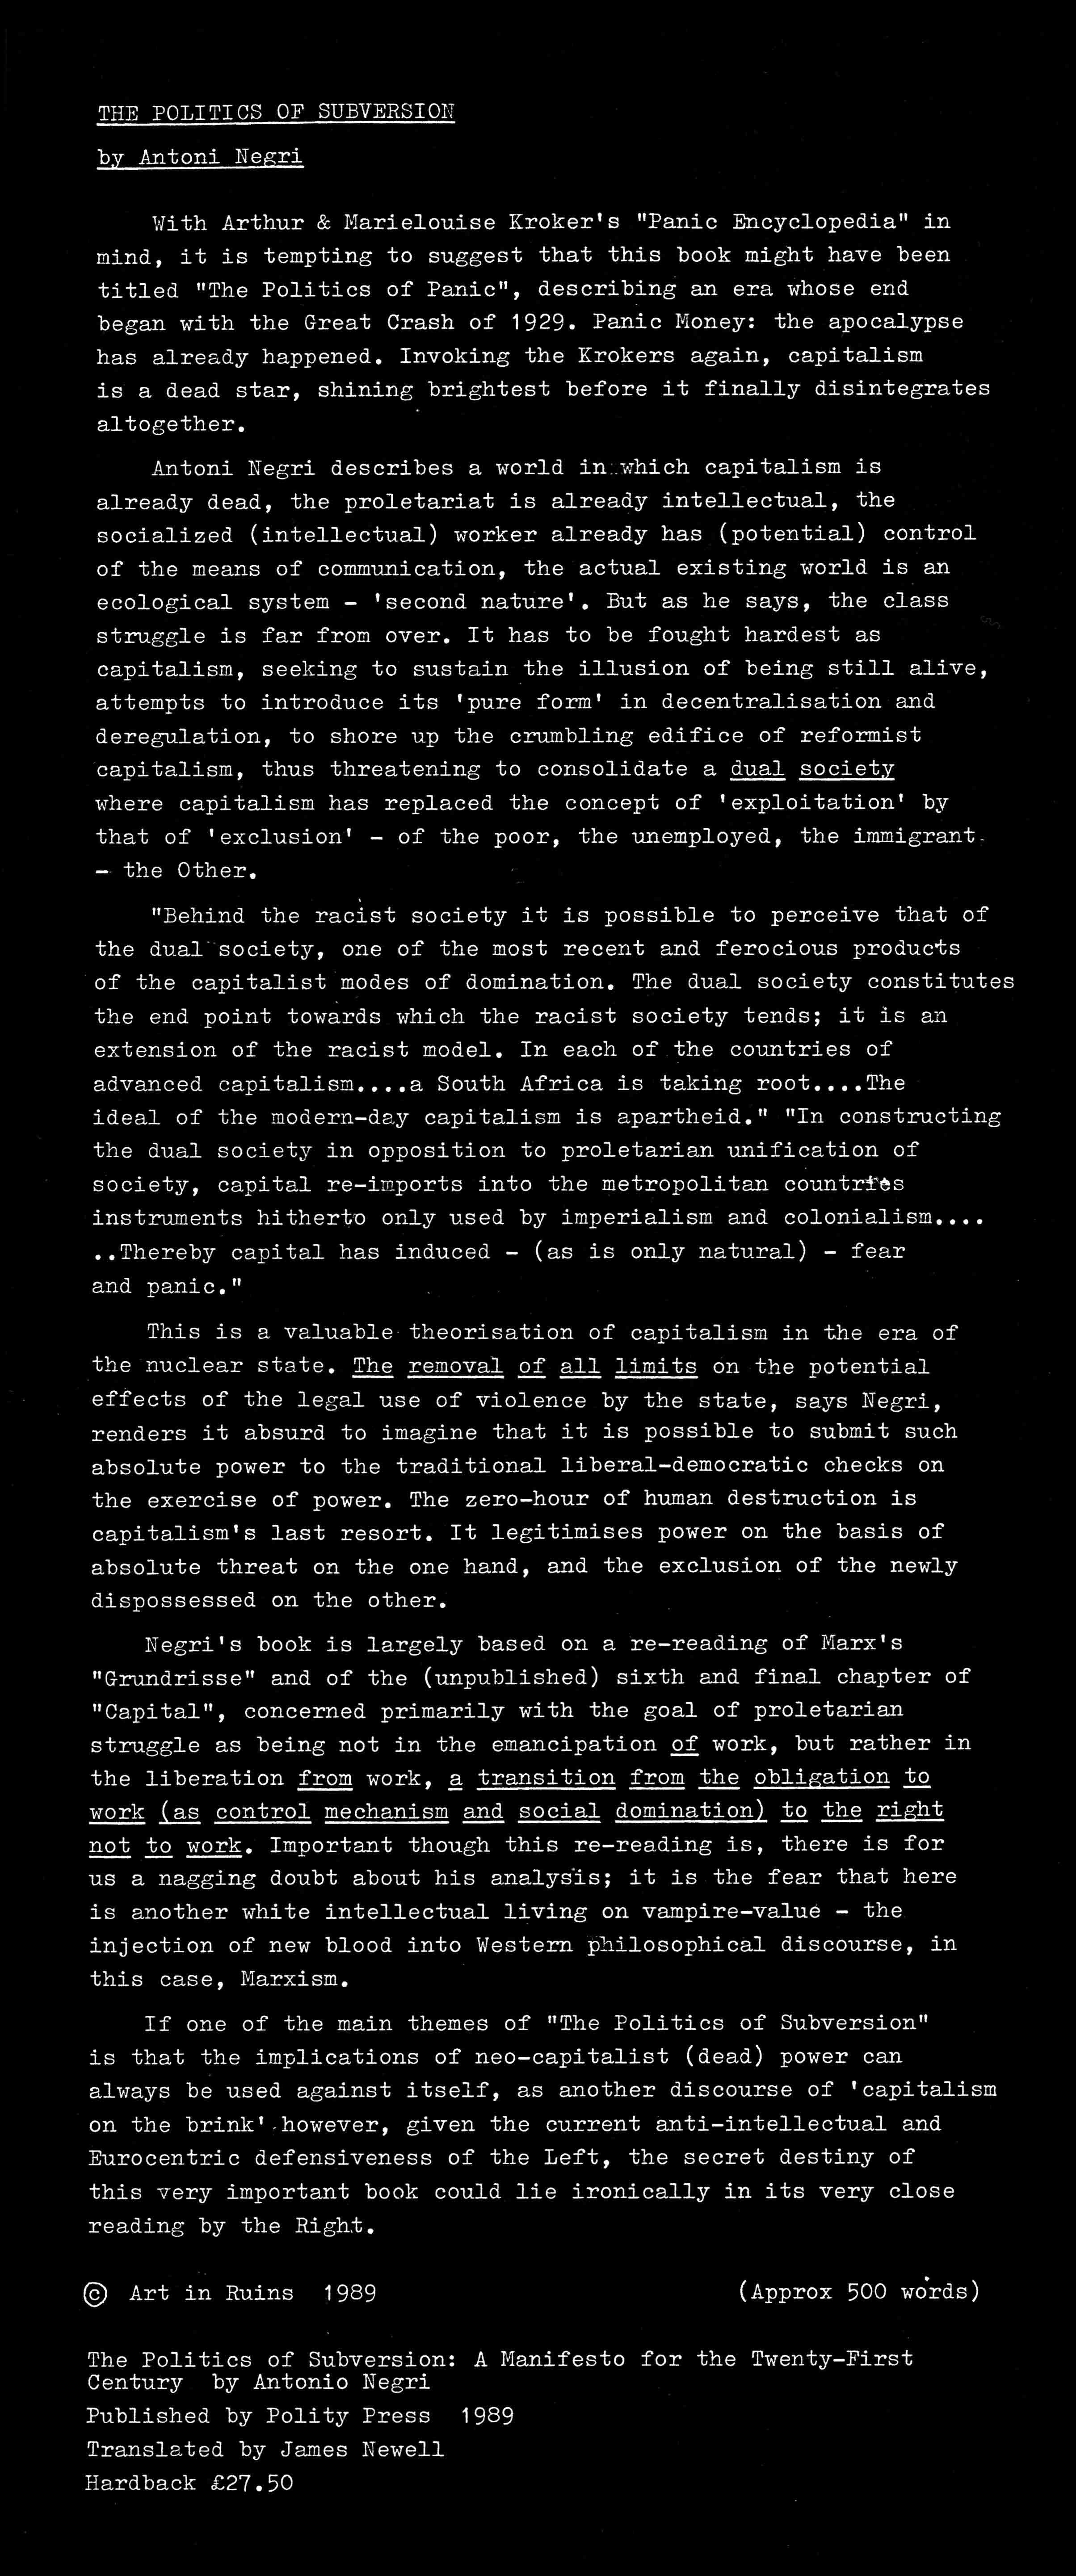 'THE POLITICS OF SUBVERSION:  A MANIFESTO FOR THE TWENTY-FIRST CENTURY'  Antonio Negri. Polity Press 1989 Review 1989